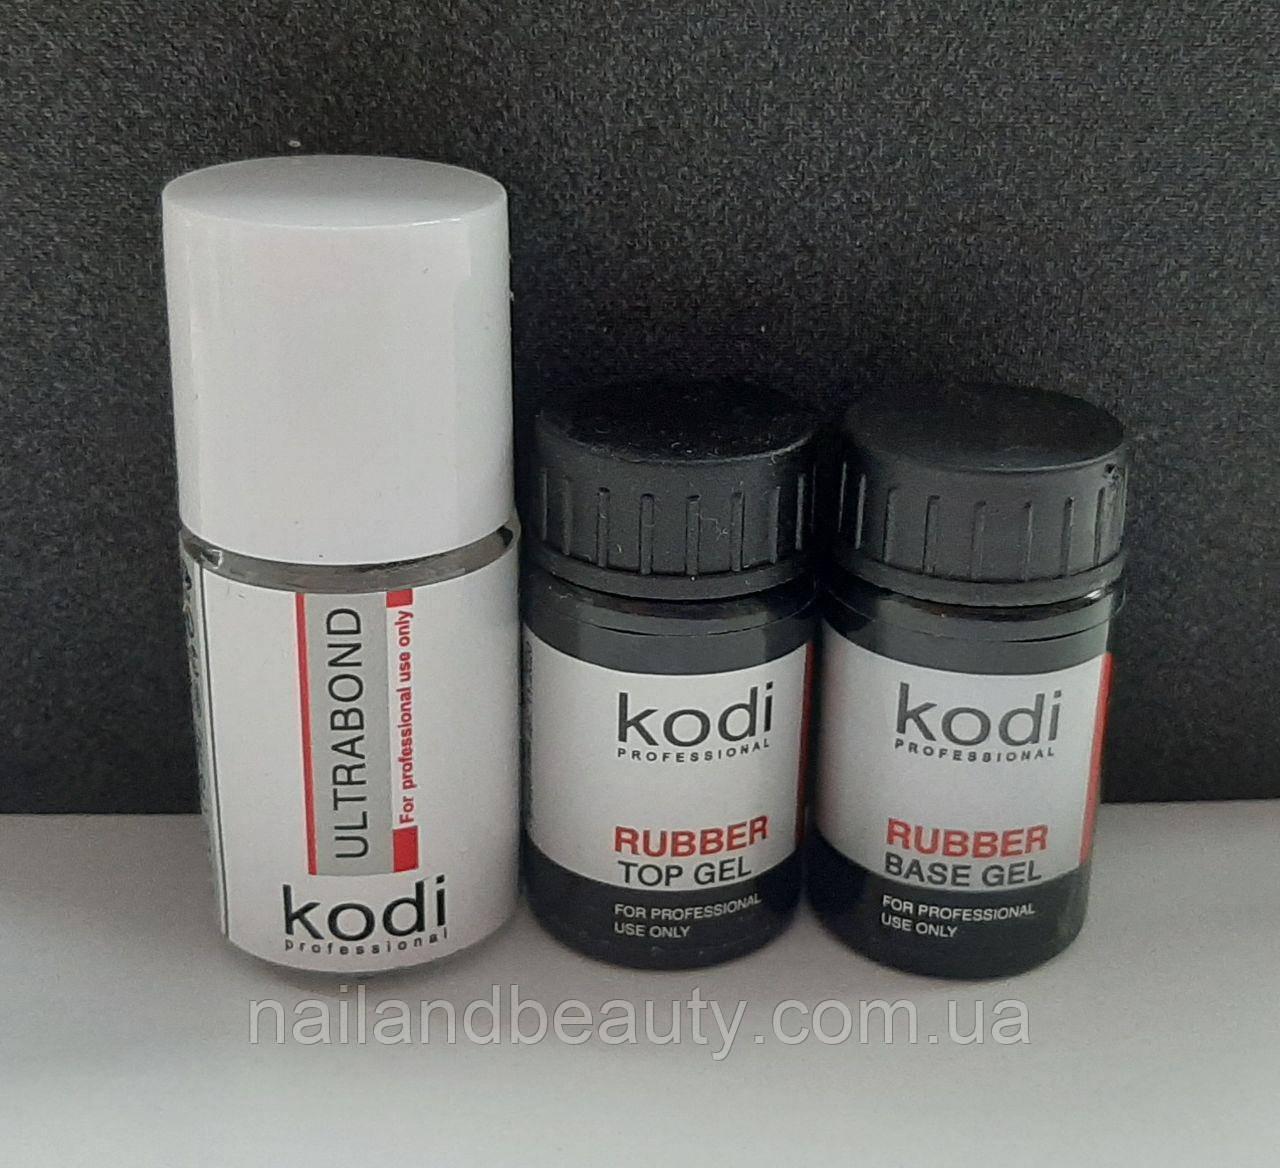 Топ и база Kodi (Base Kodi 14 ml + Rubber Top Kodi 14 ml + Ultrabond Kodi 15 ml \ Набор База Топ Бонд Коди)